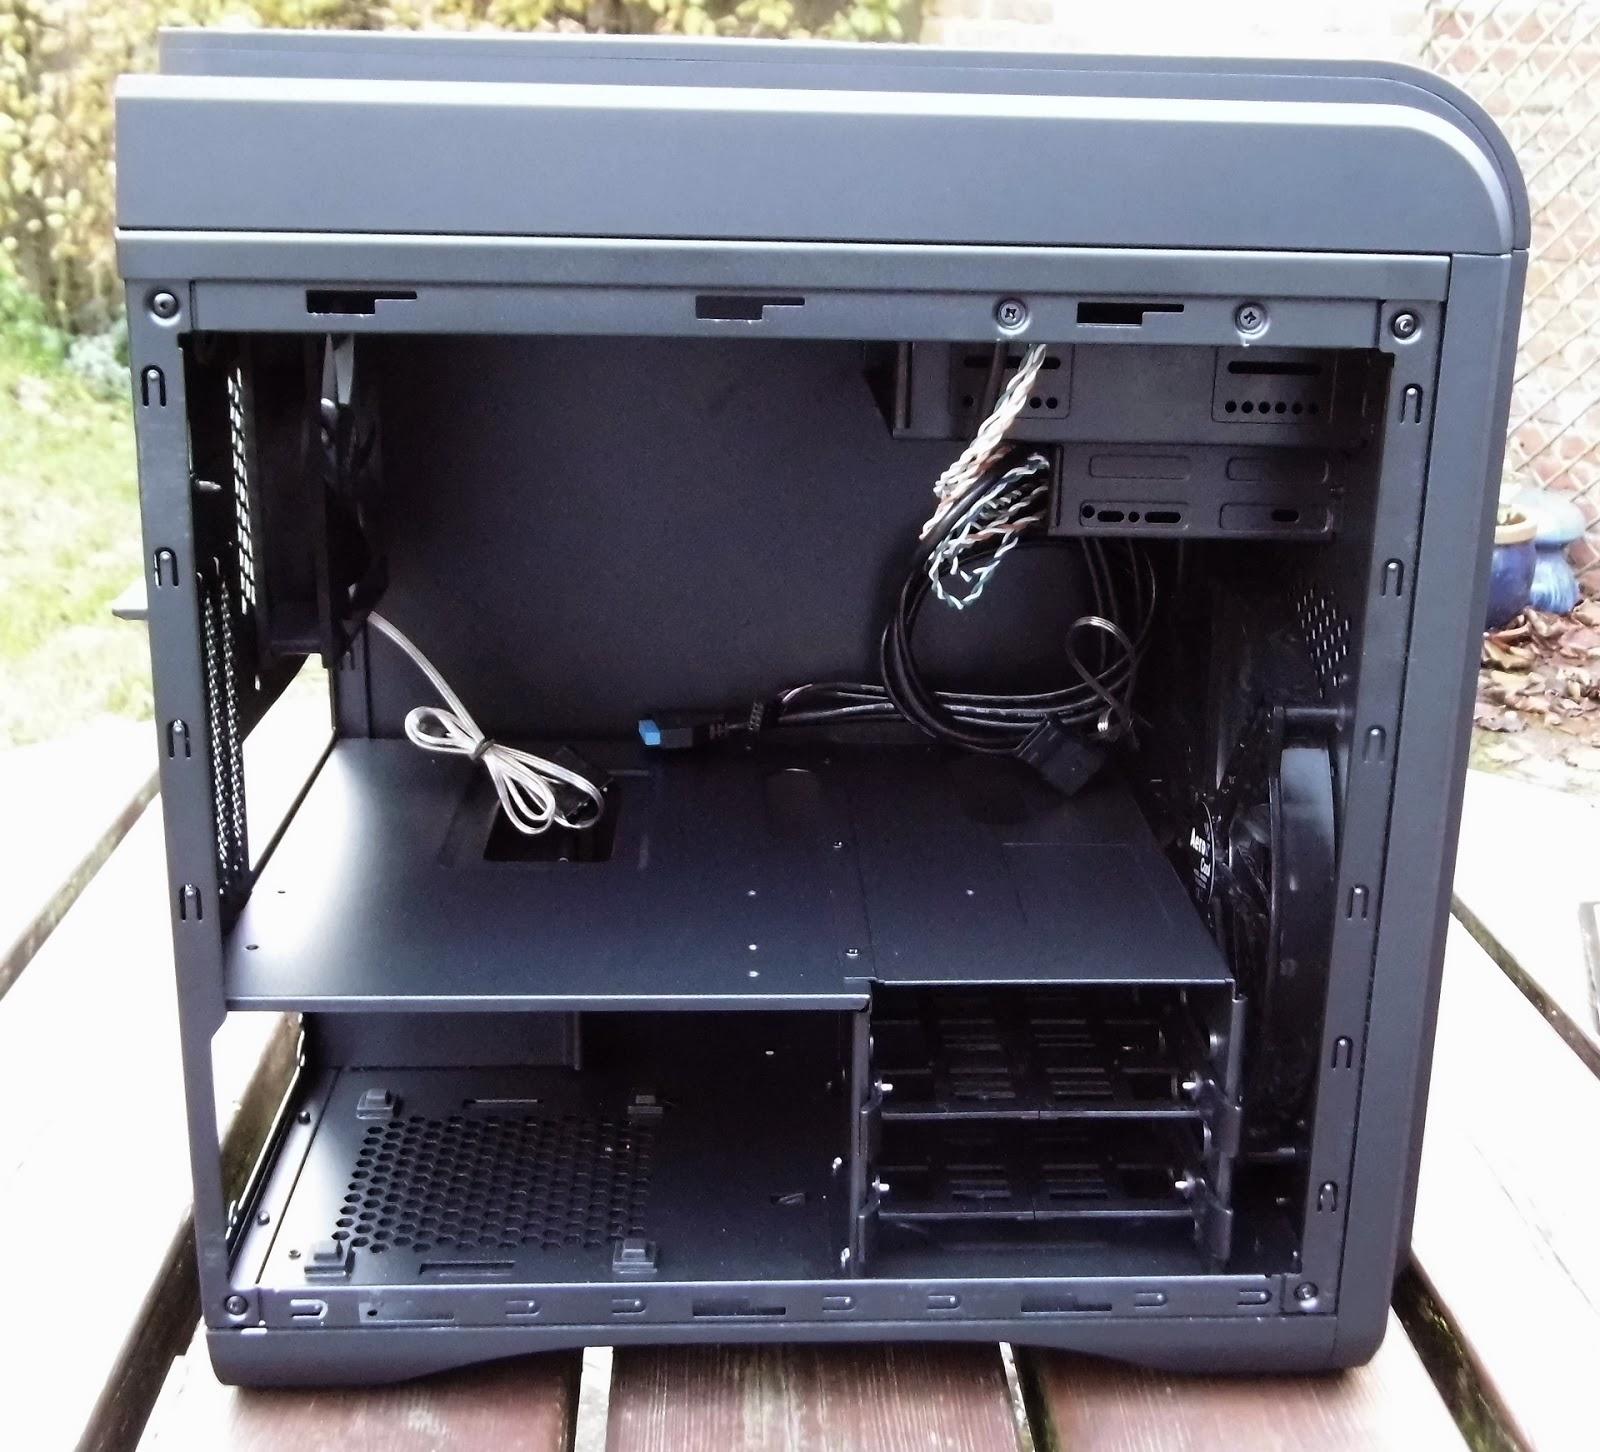 la-centrale-du-hardware-test-boitier-aerocol-ds-dead-silence-cube-chassis